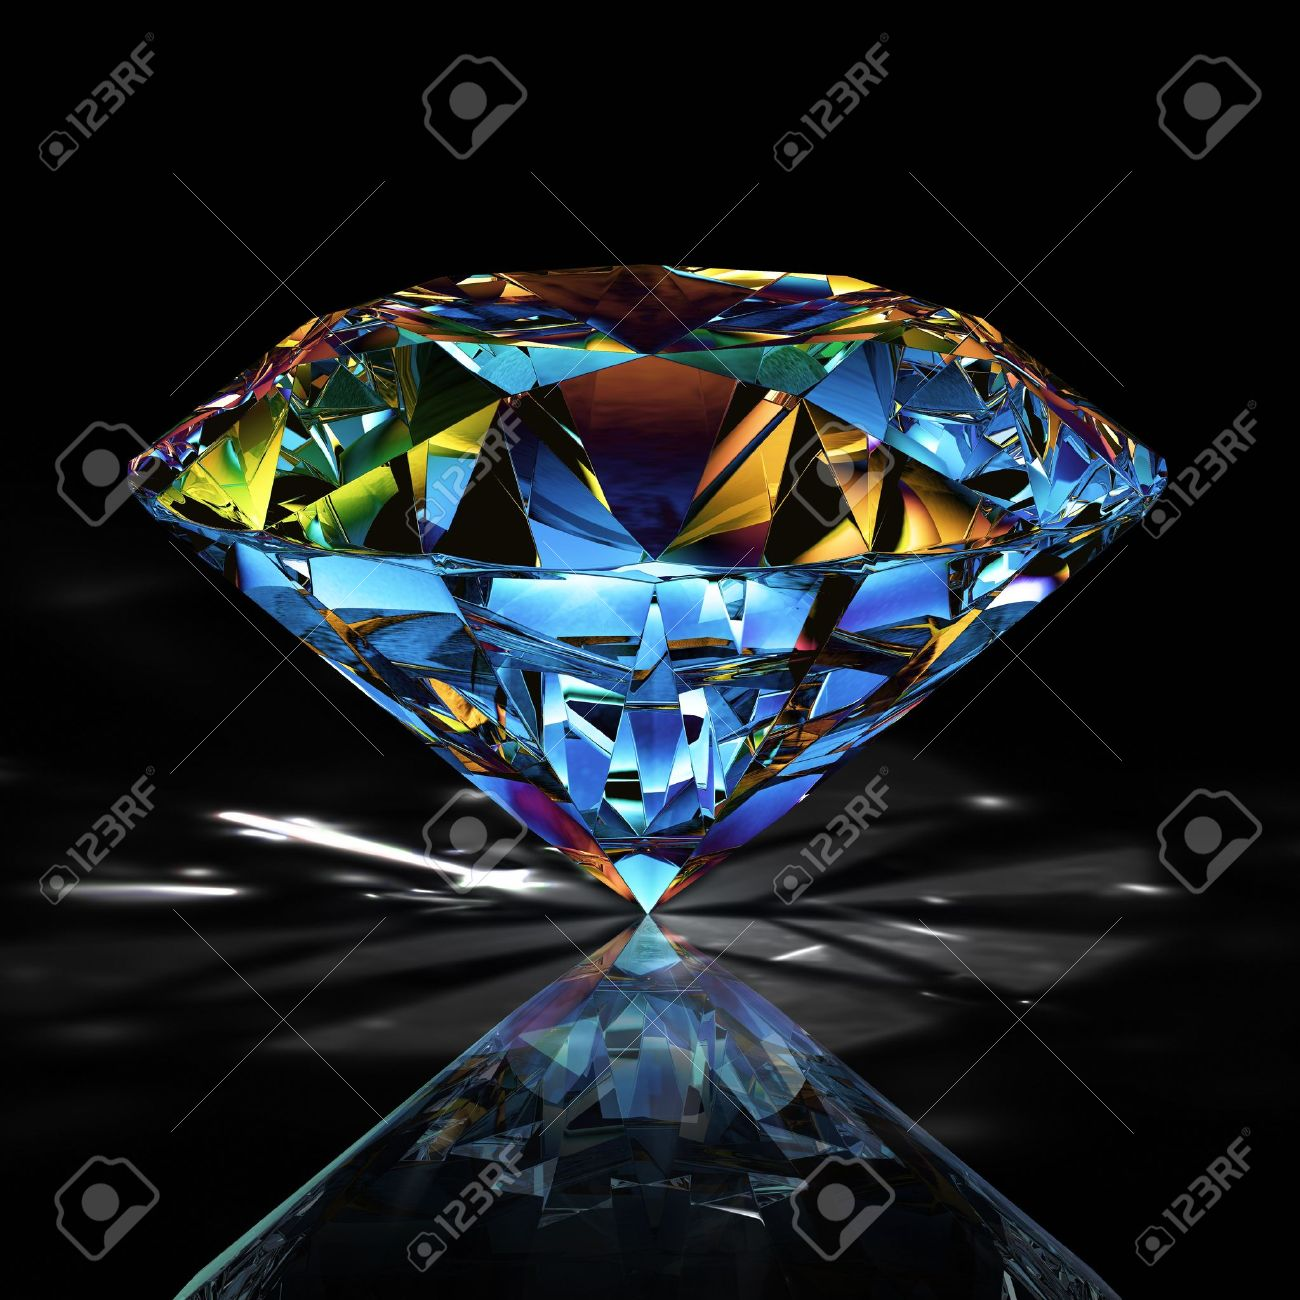 diamond on black background Stock Photo - 8528894